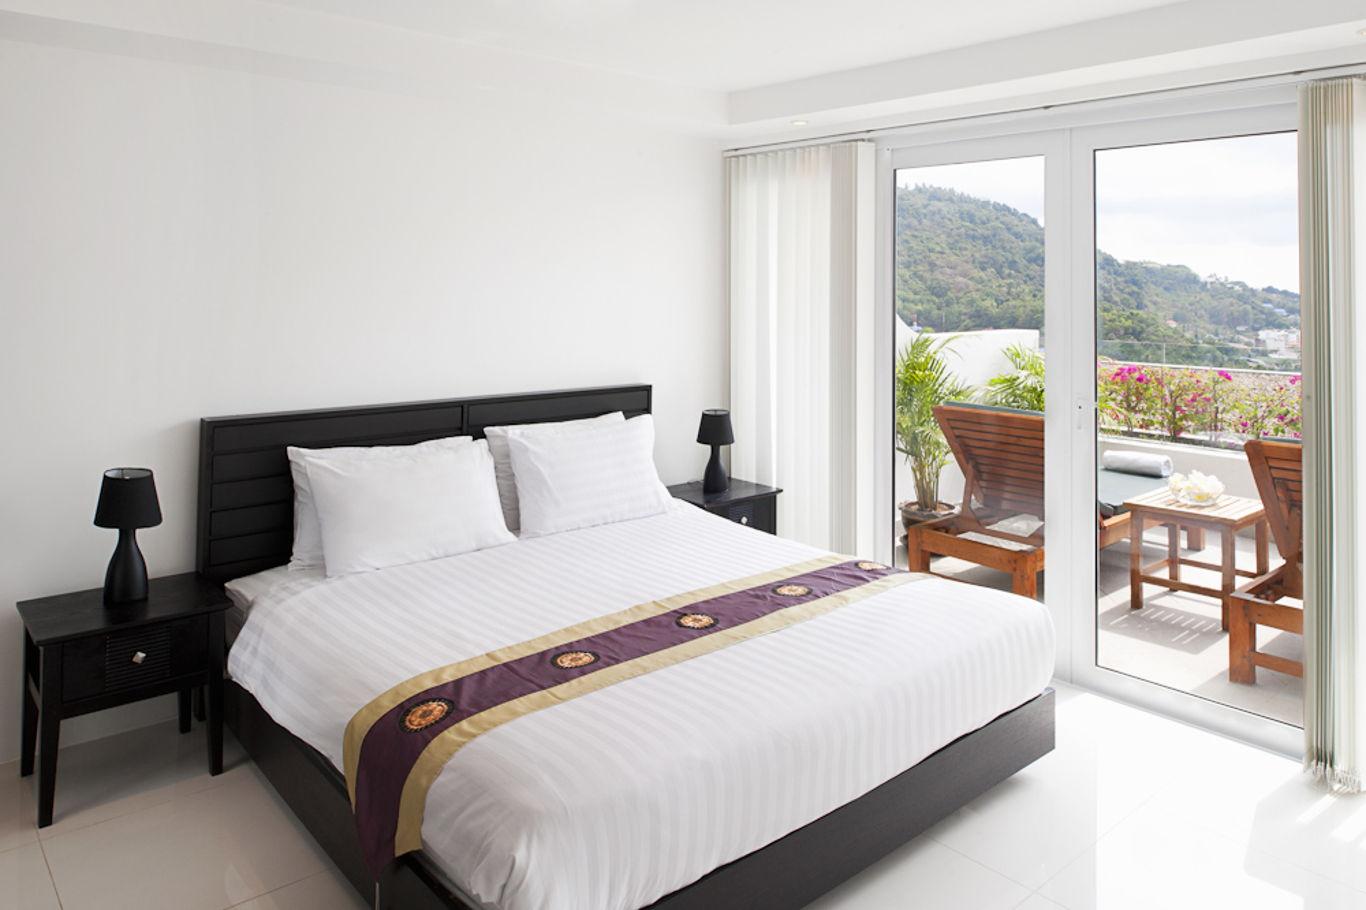 Phuket Holiday Services Kata Ocean View Residence 1 Bedroom Pearl Bedroom